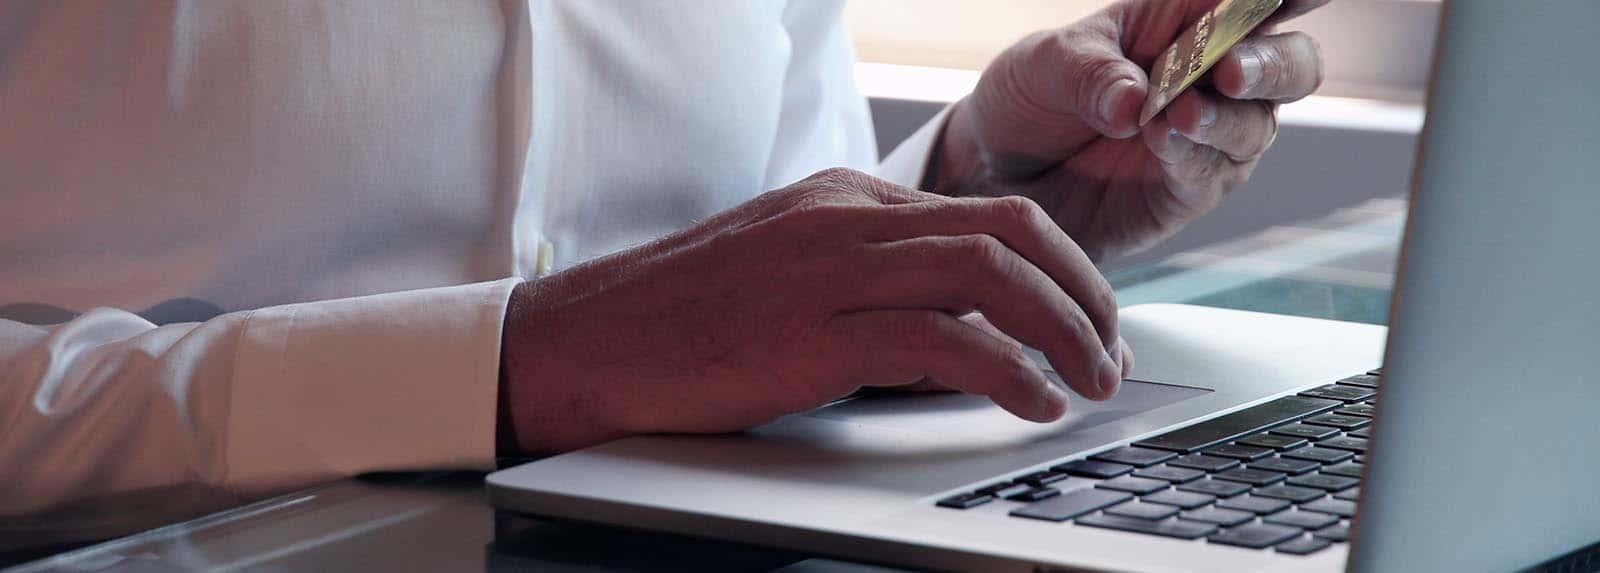 webbintegration visma business